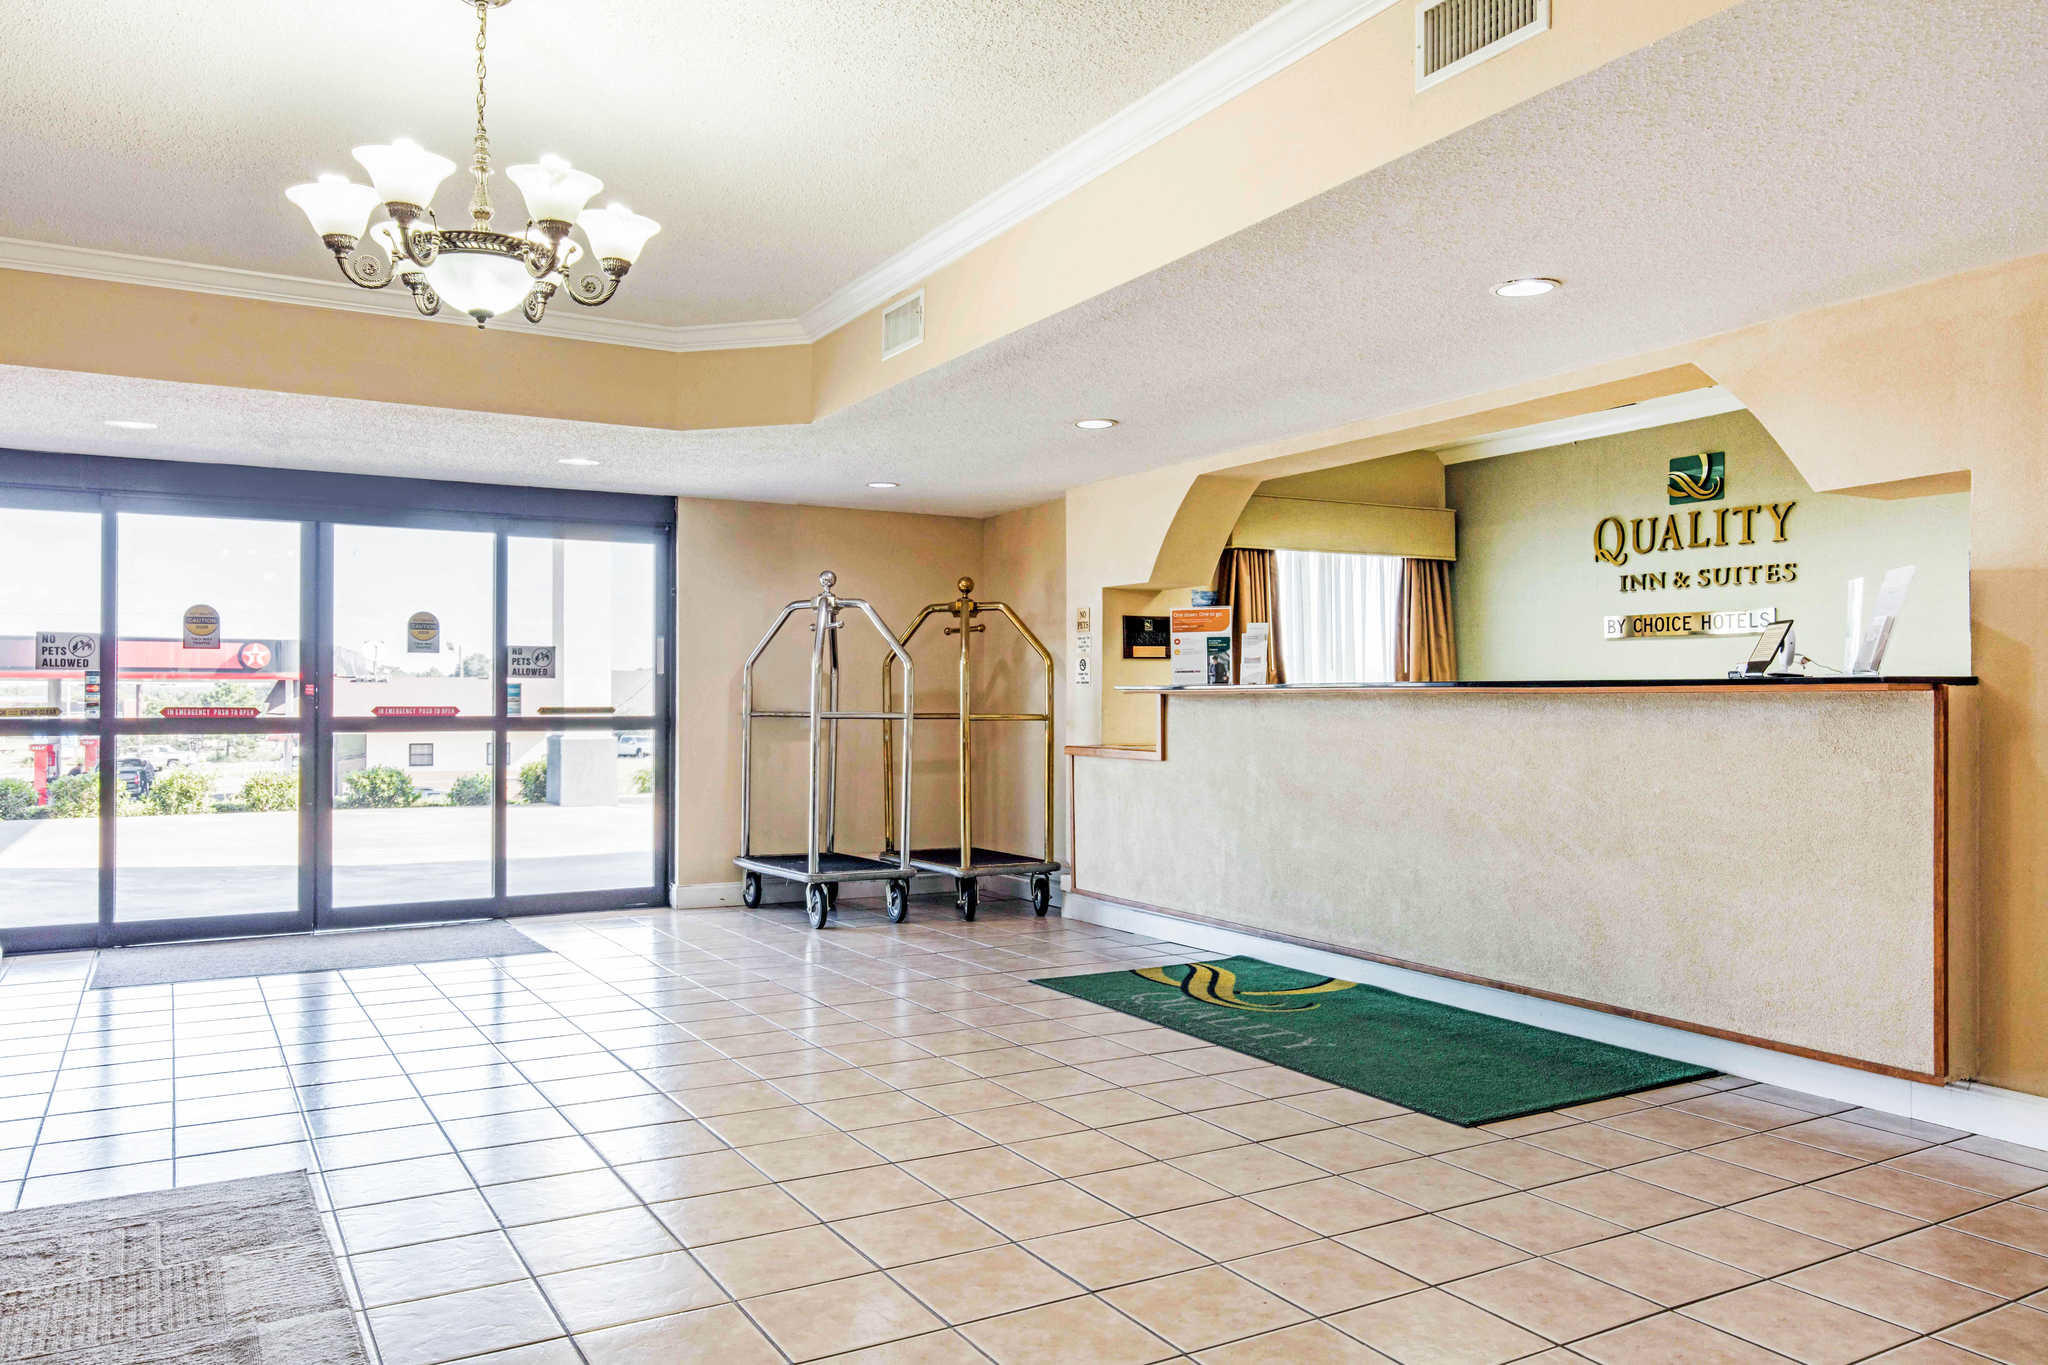 Quality Inn & Suites Jackson Int'l Airport image 6